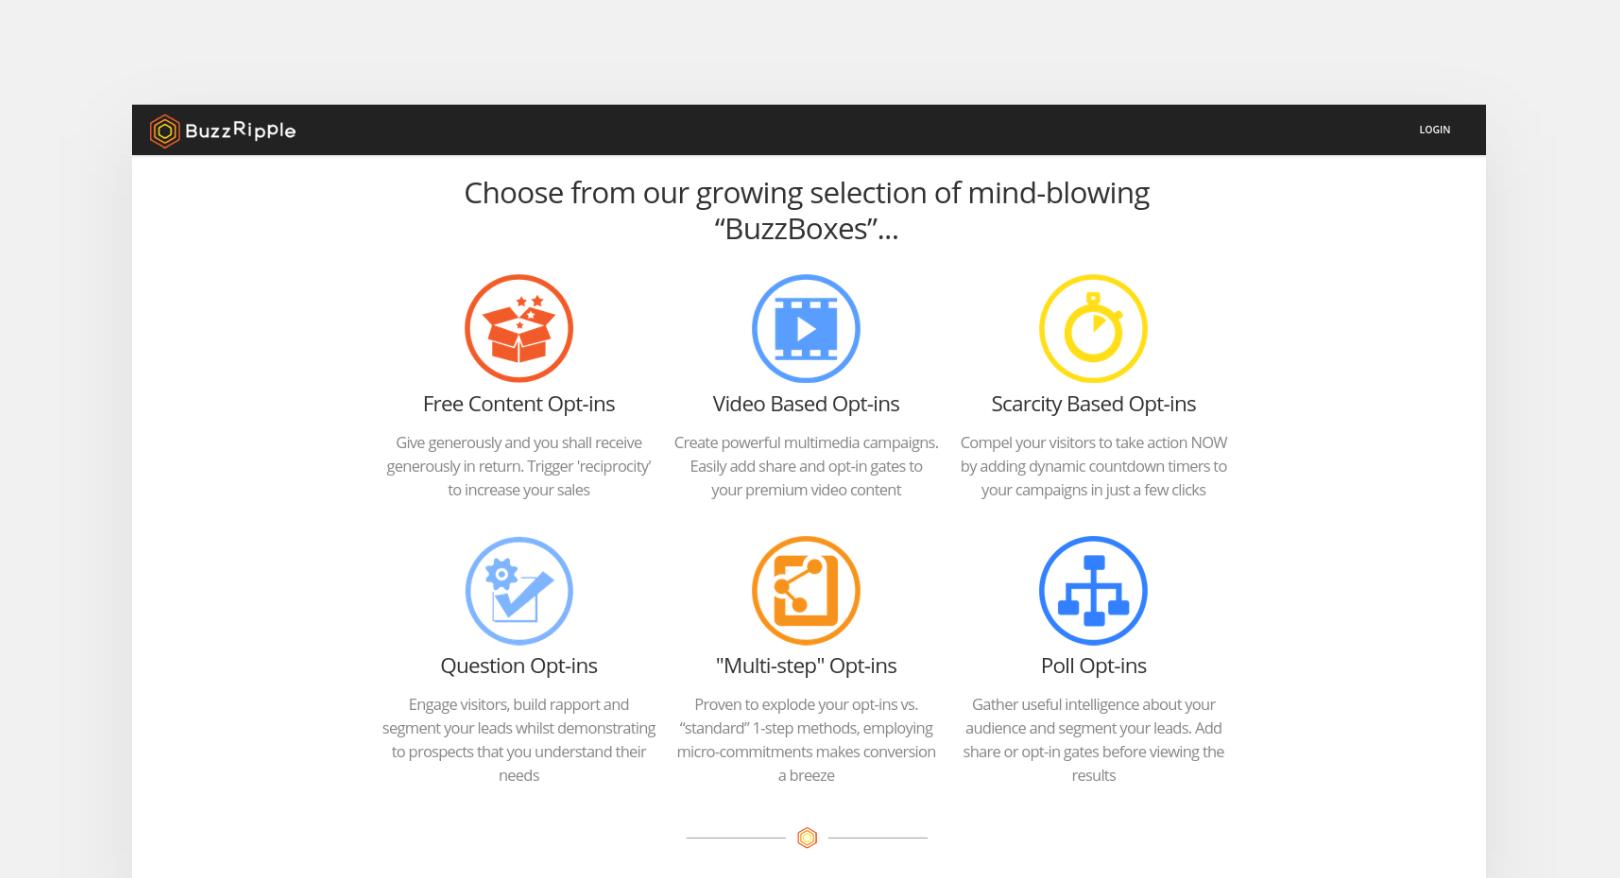 BuzzRipple BuzzBoxes screenshot